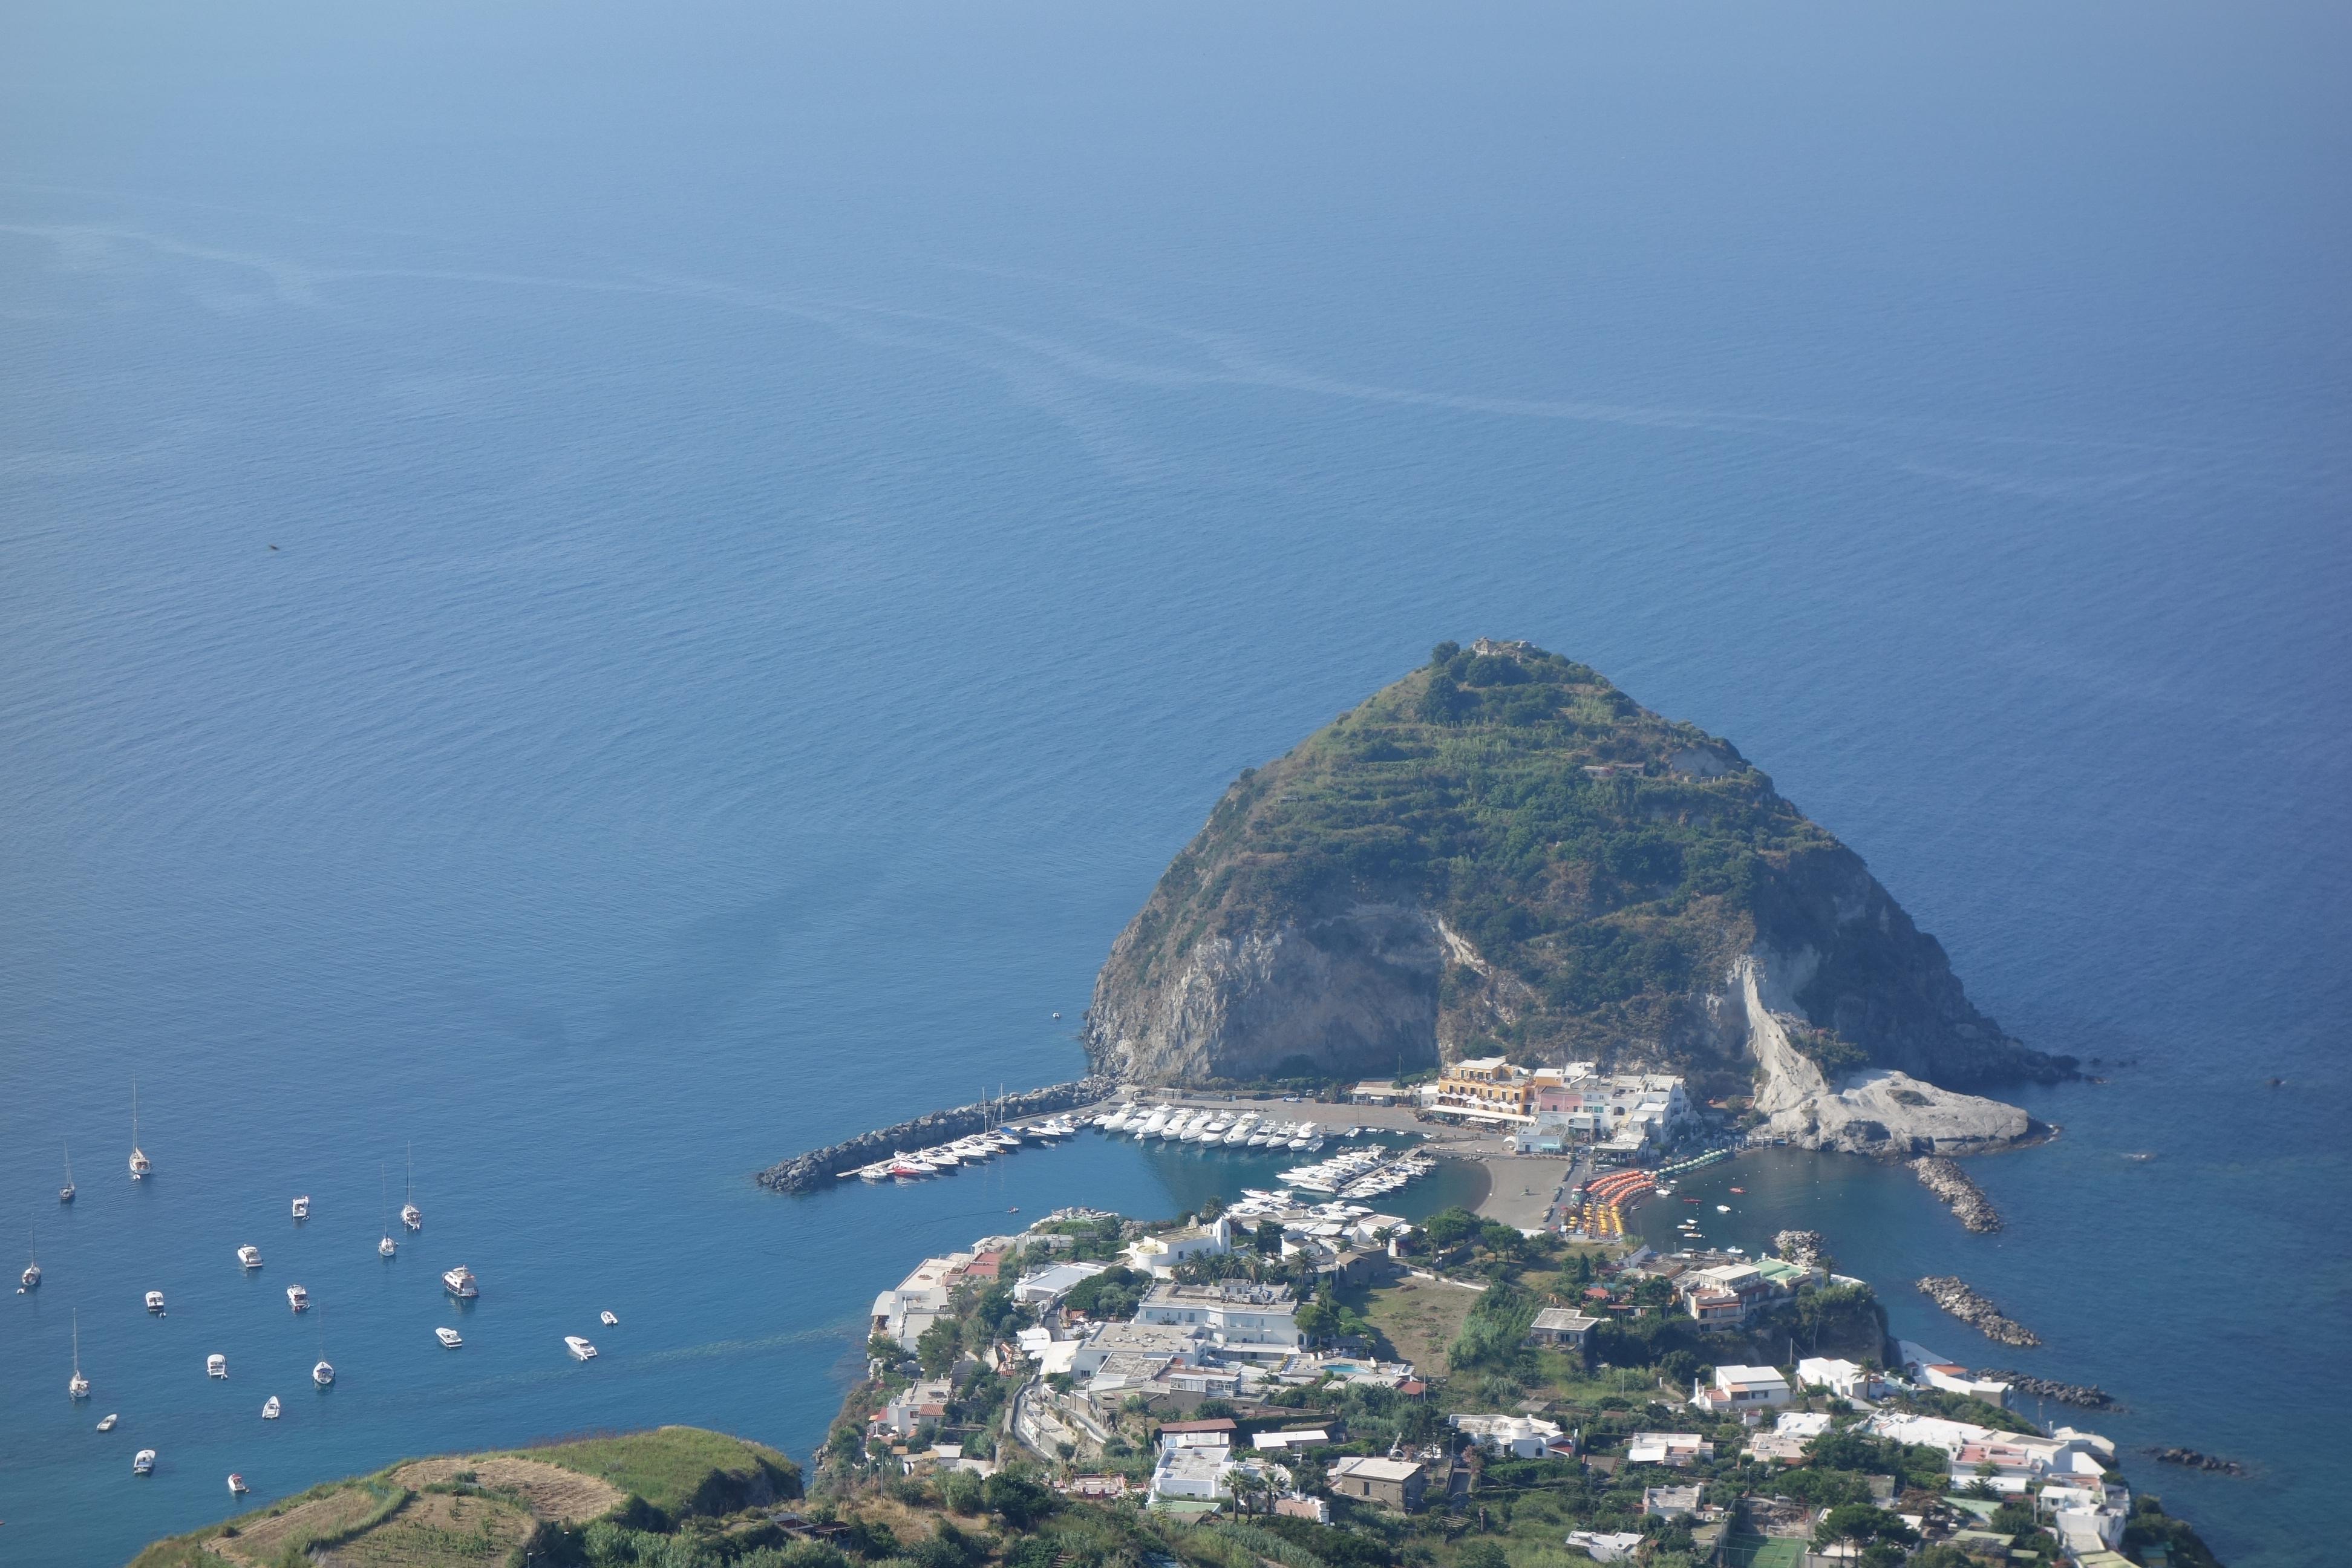 Visiter Ischia quand on n'a pas d'argent